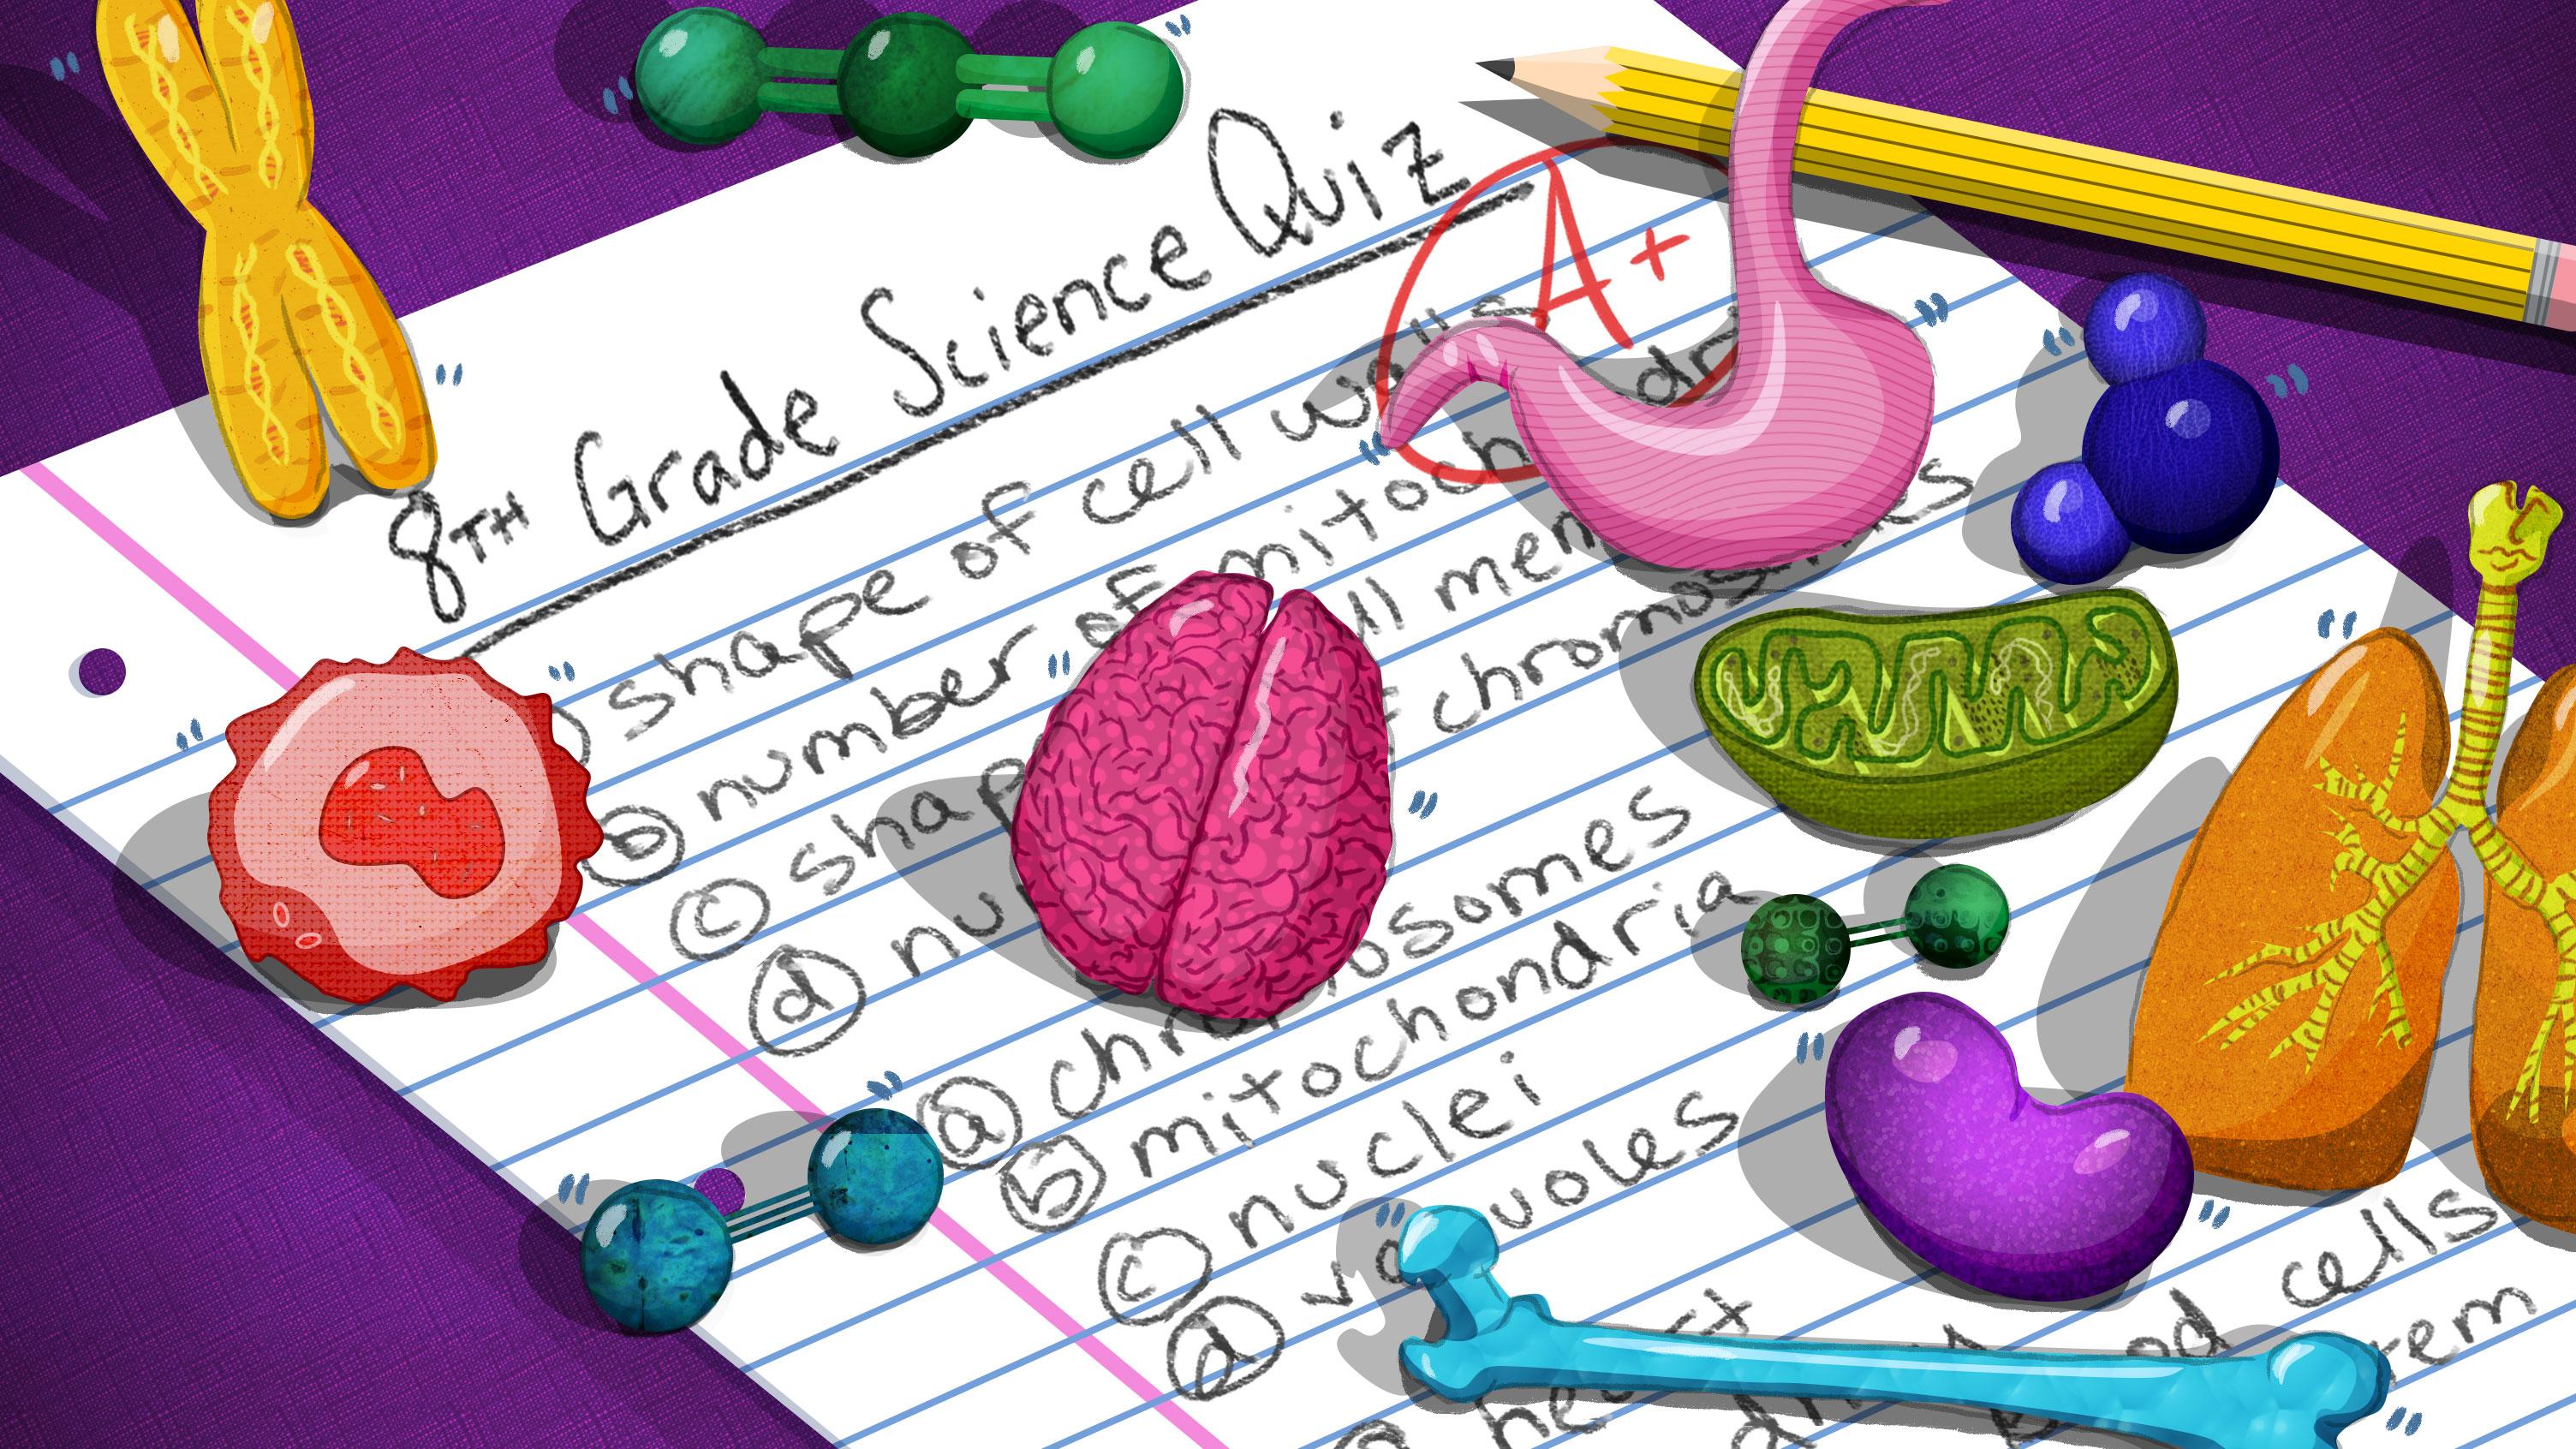 Virginia 8th Grade Science Test